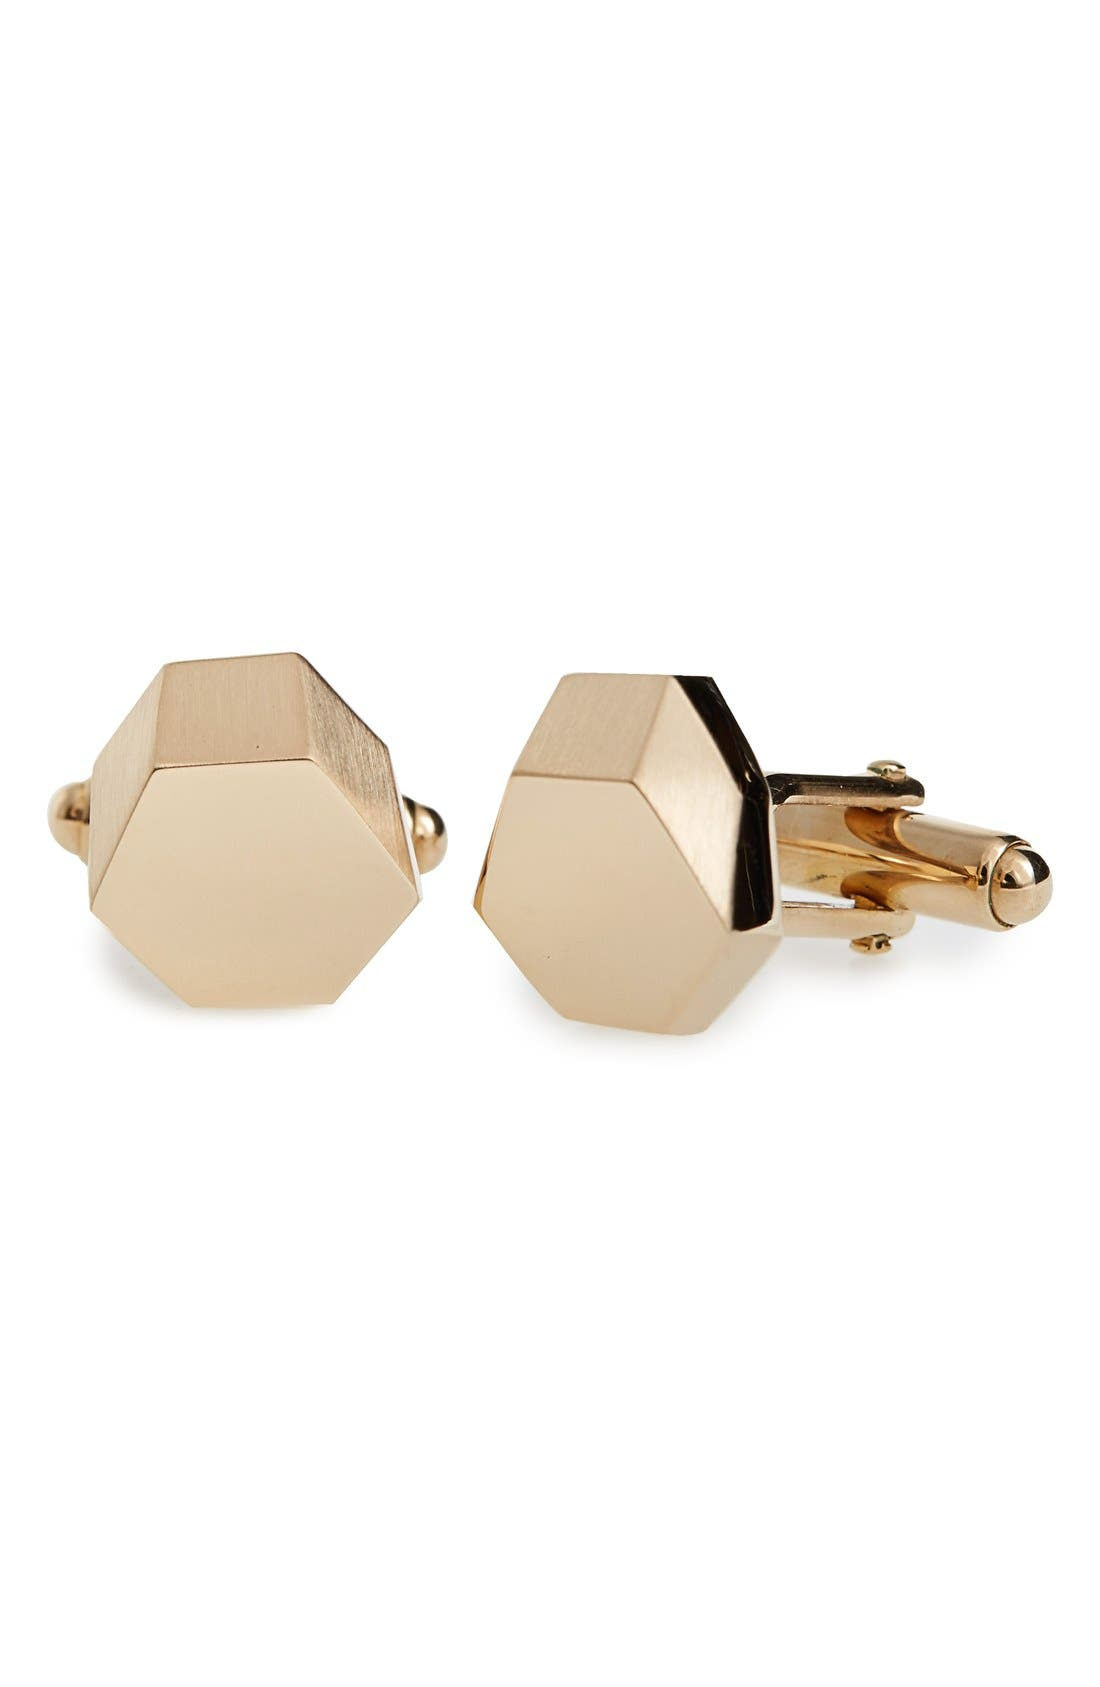 Main Image - Lanvin Hexagonal Metal Cuff Links